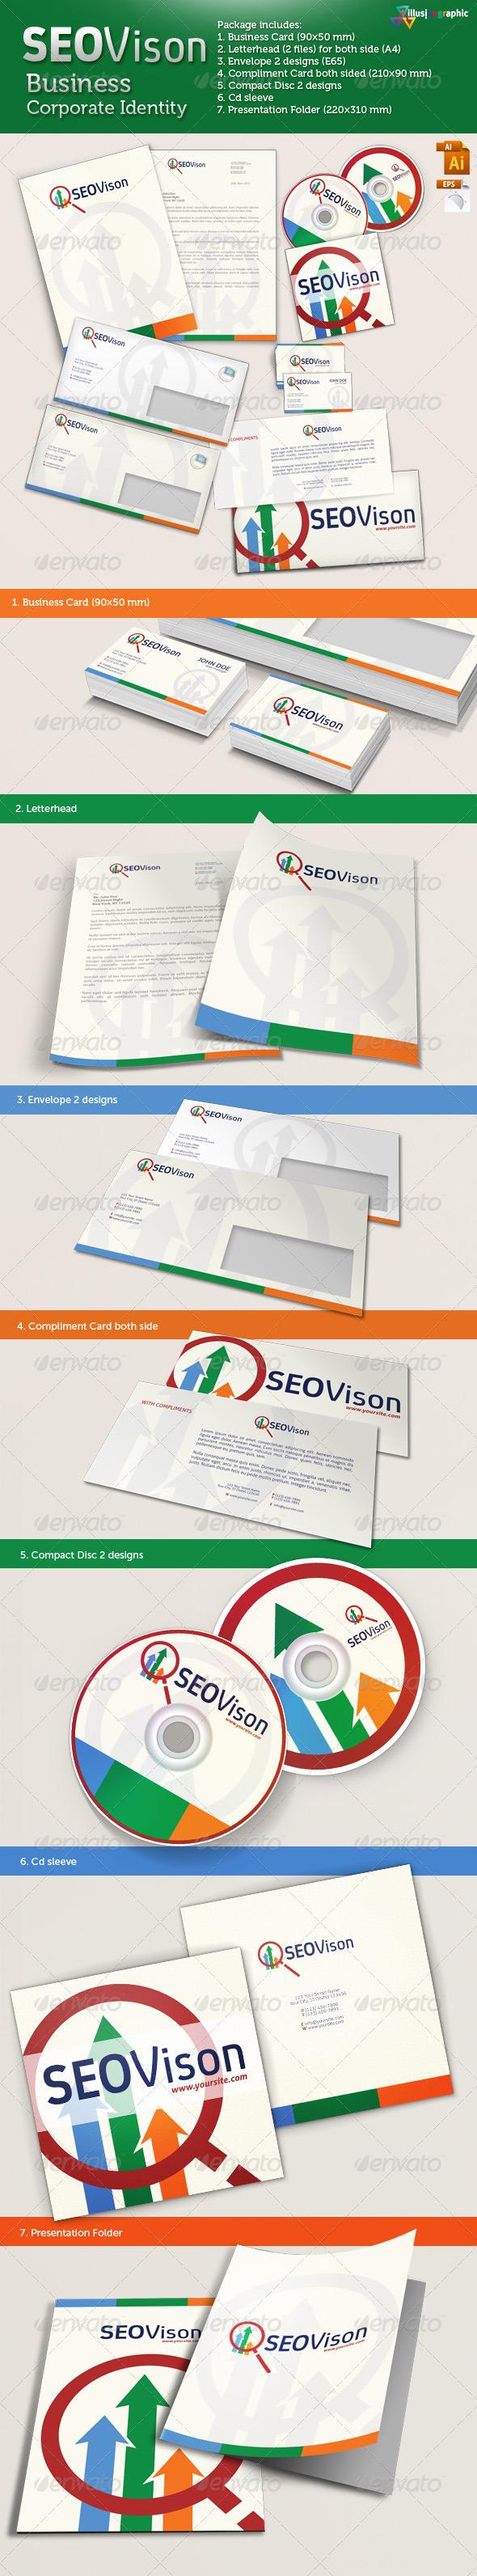 SEOVison - Business Corporate Identity - Stationery Print Templates